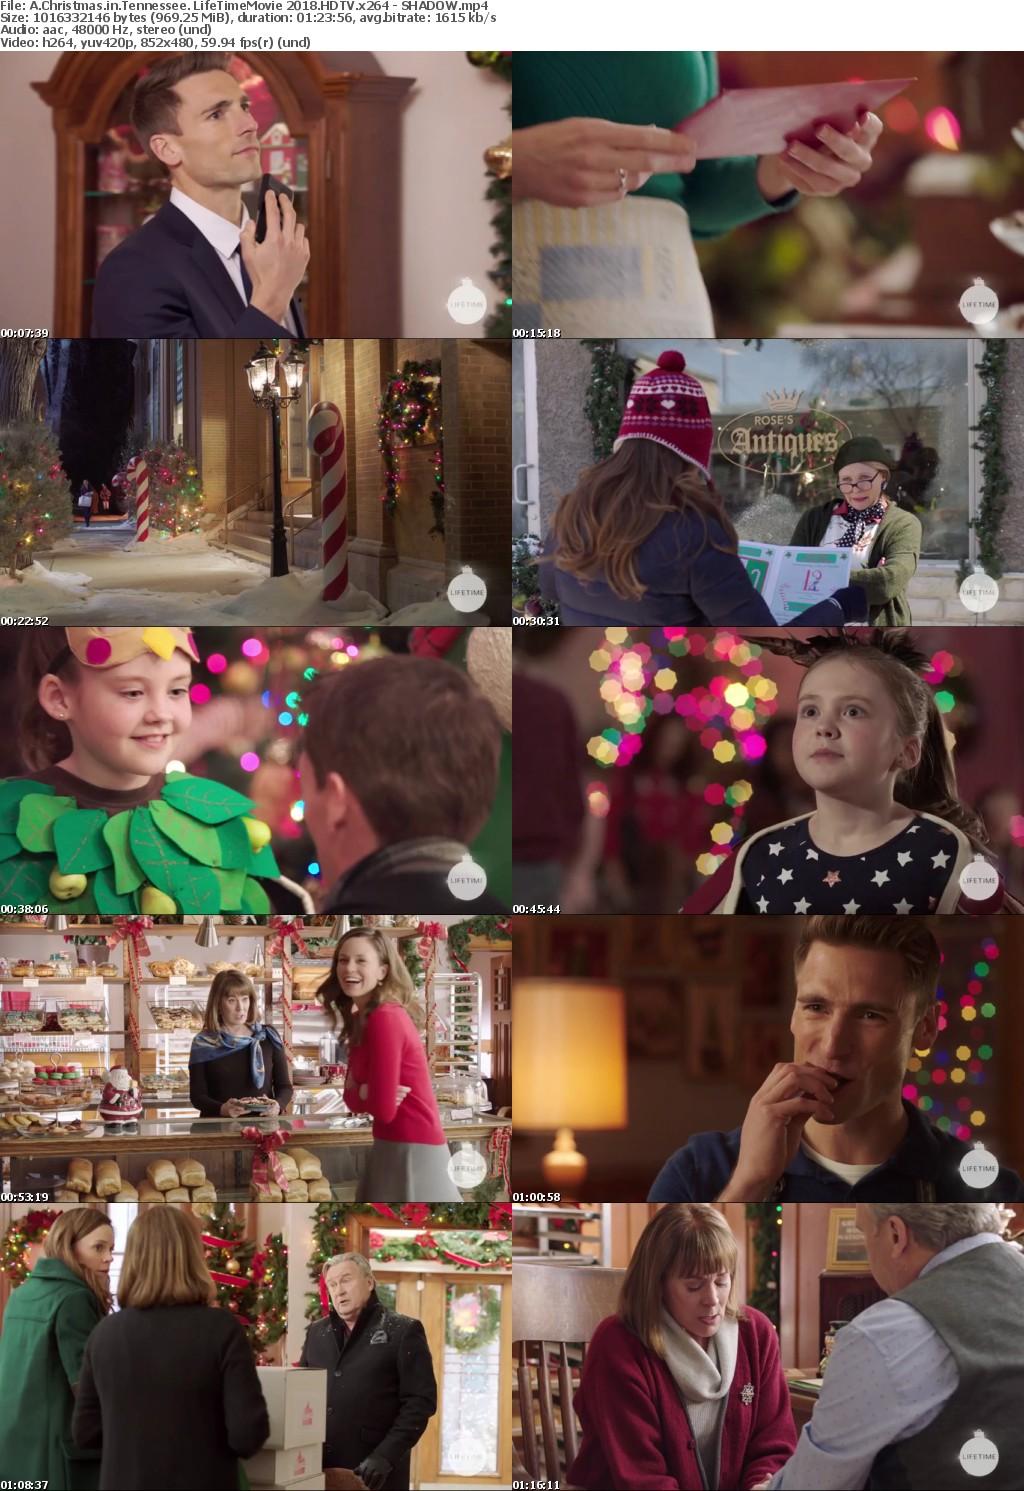 A Christmas in Tennessee LifeTimeMovie (2018) HDTV x264 - SHADOW